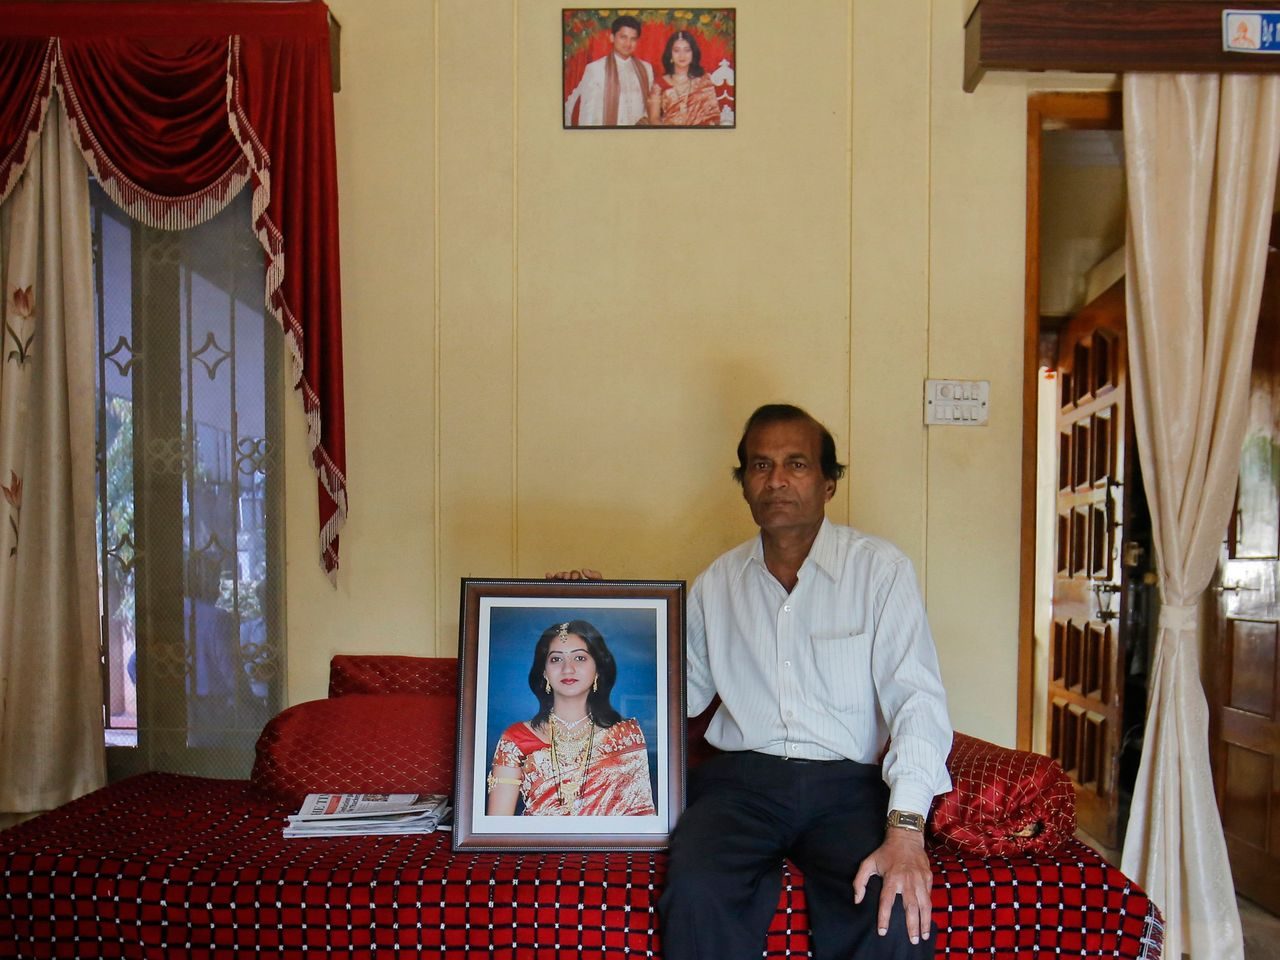 Andanappa Yalagi's daughter Savita Halappanavar died of an infection after an Irish hospital denied her a lifesaving abortion in 2012.